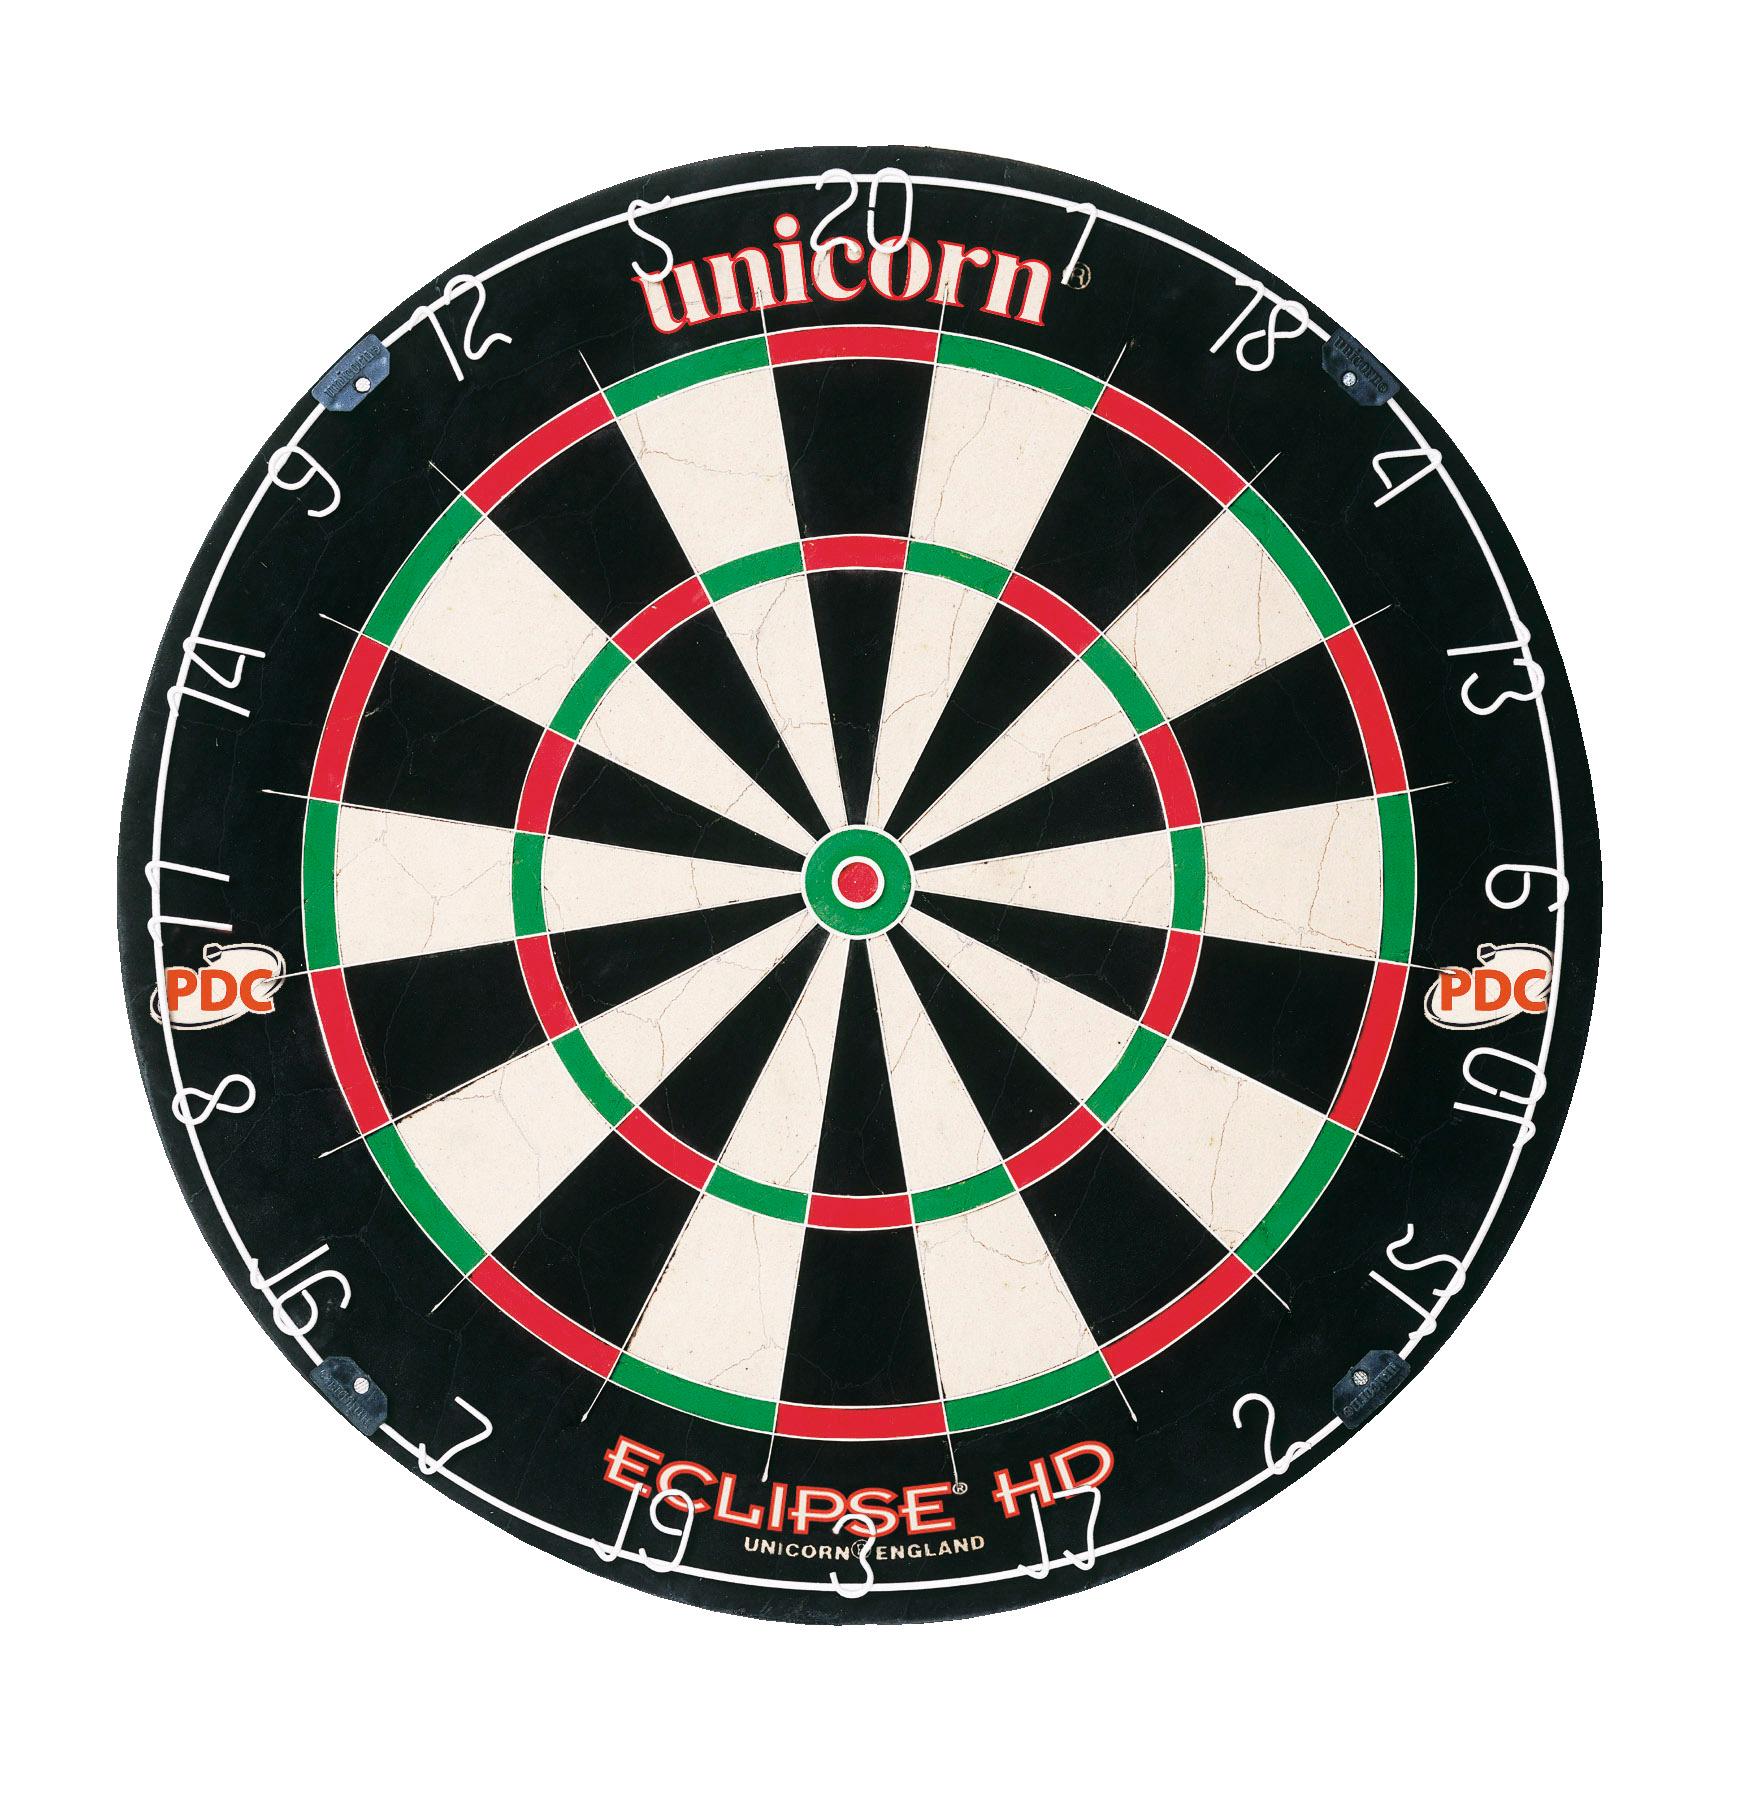 pl darts